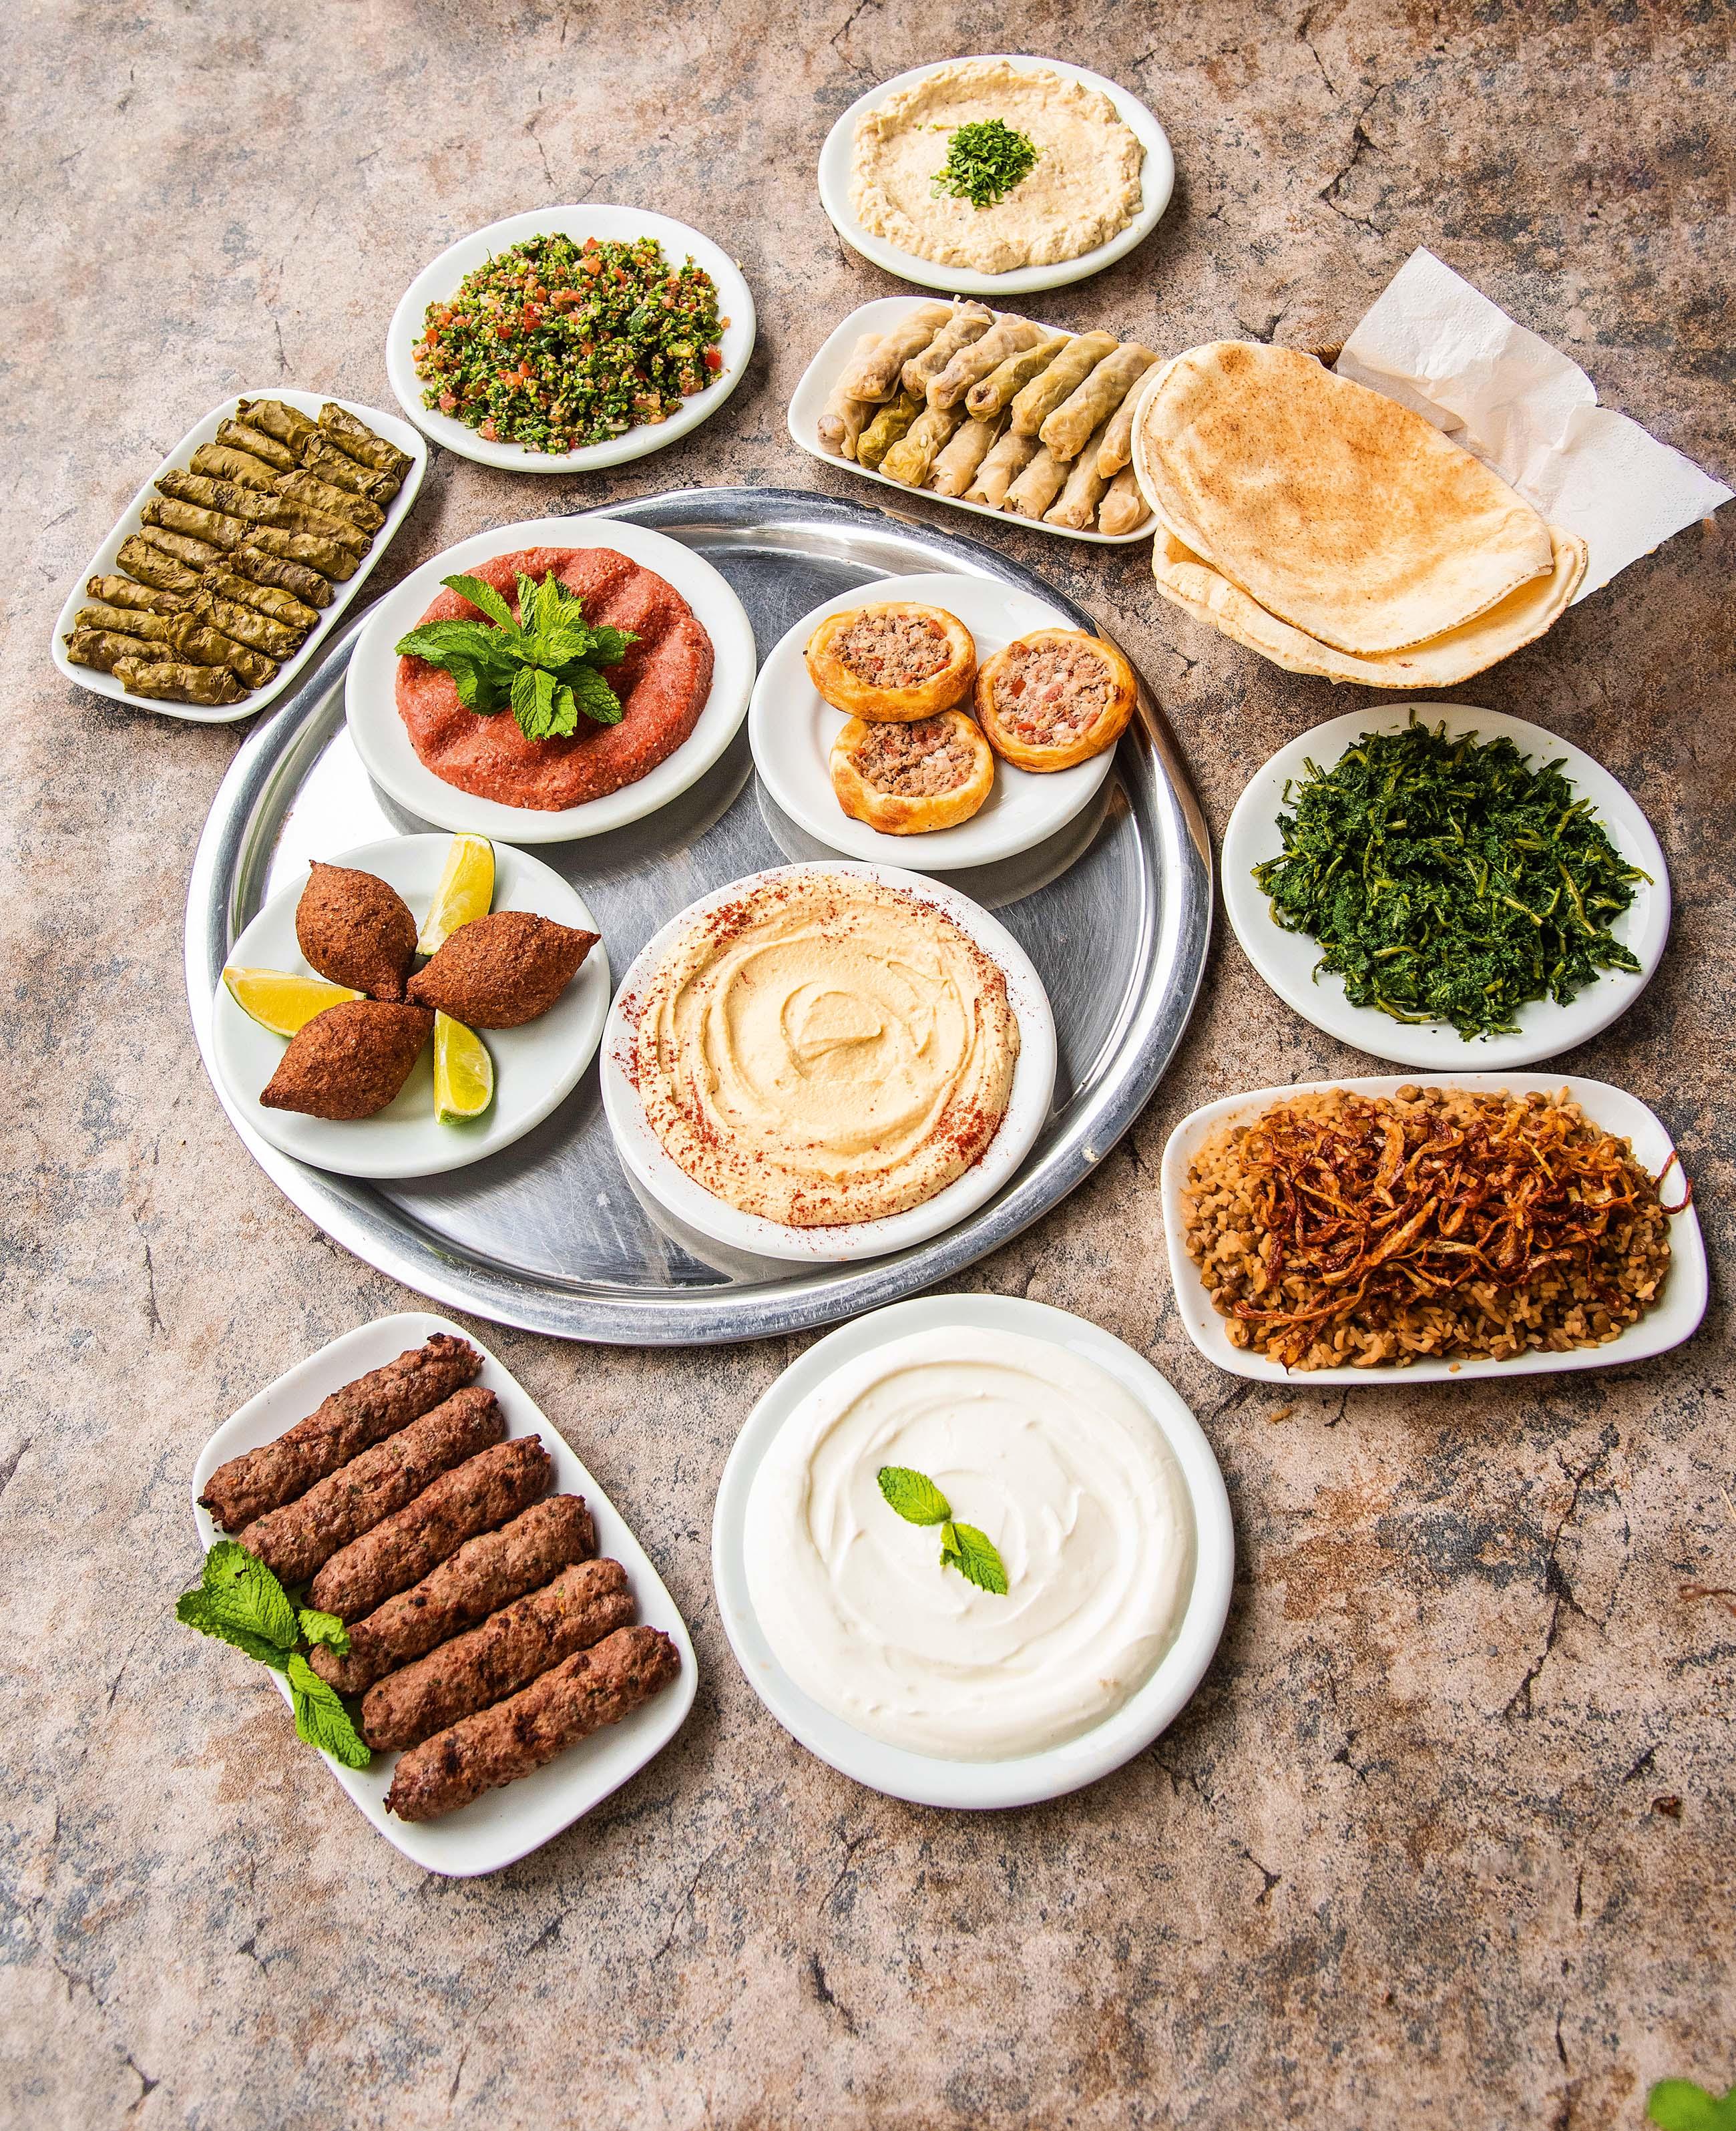 Comer & Beber 2020/2021 - Restaurantes - Árabe - Monte Líbano